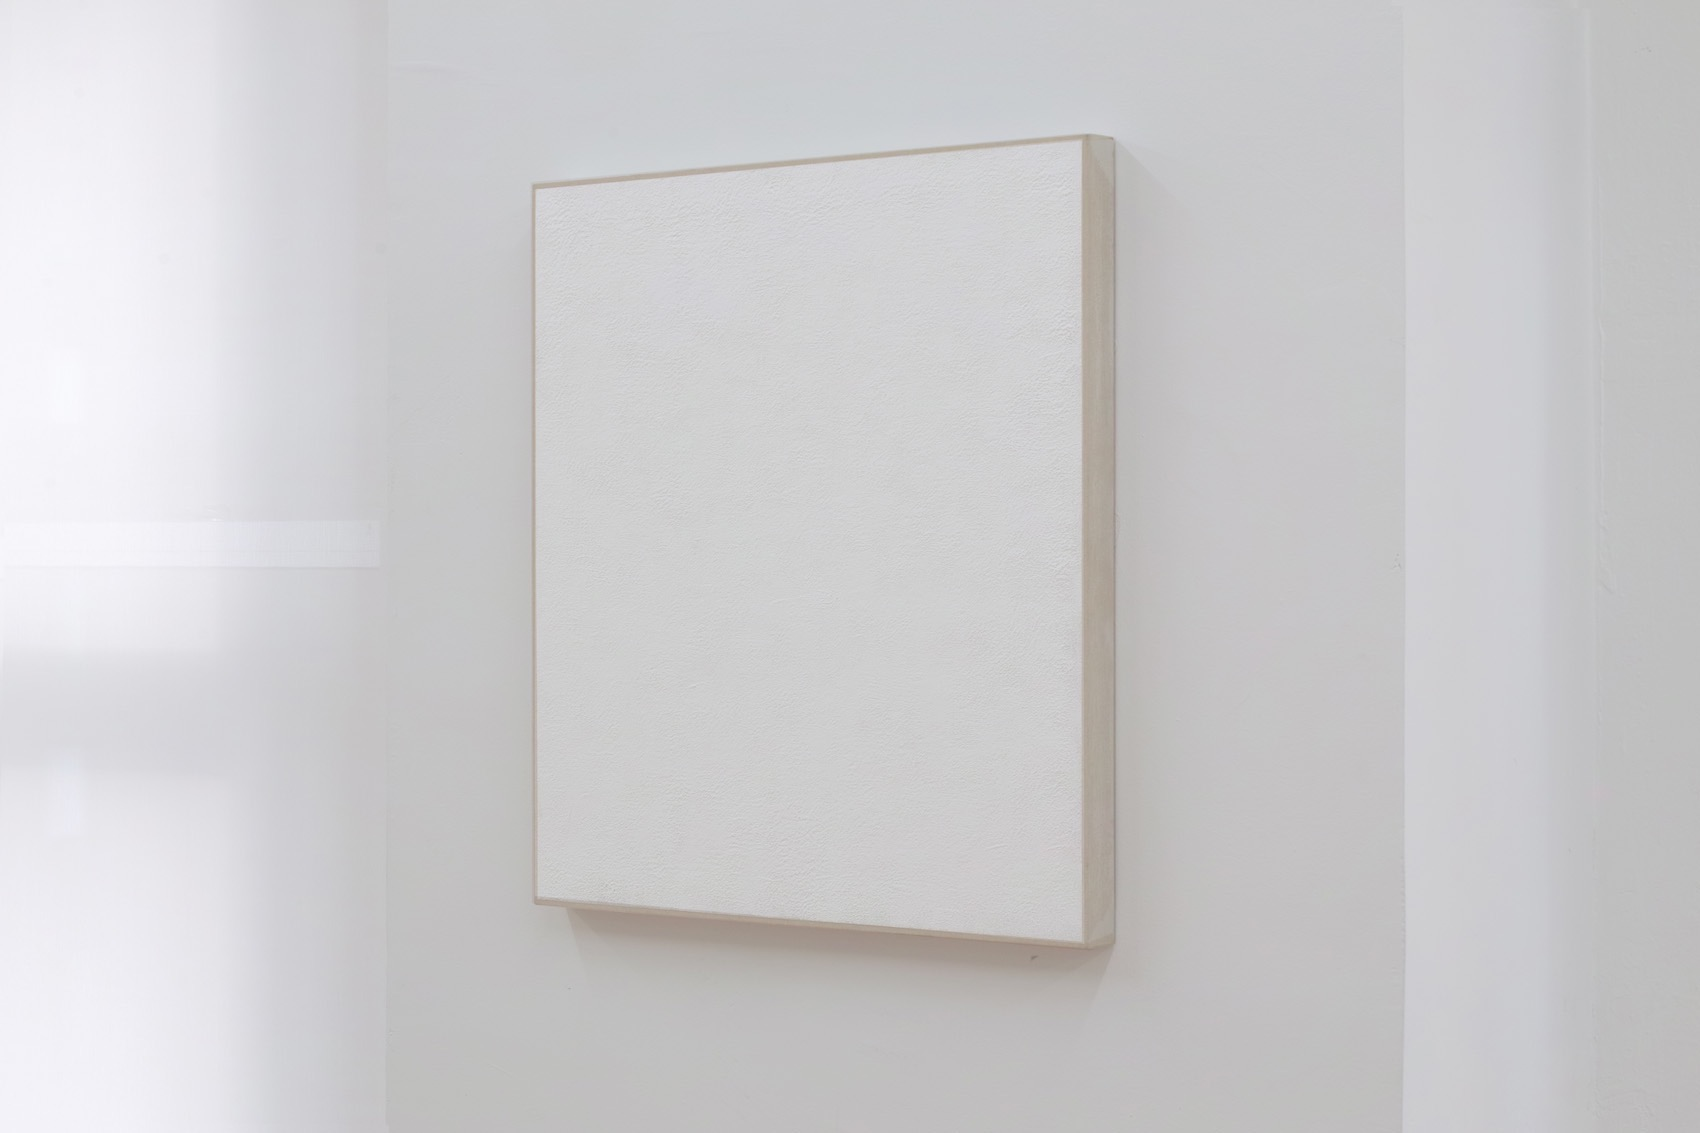 Daniel Levine install